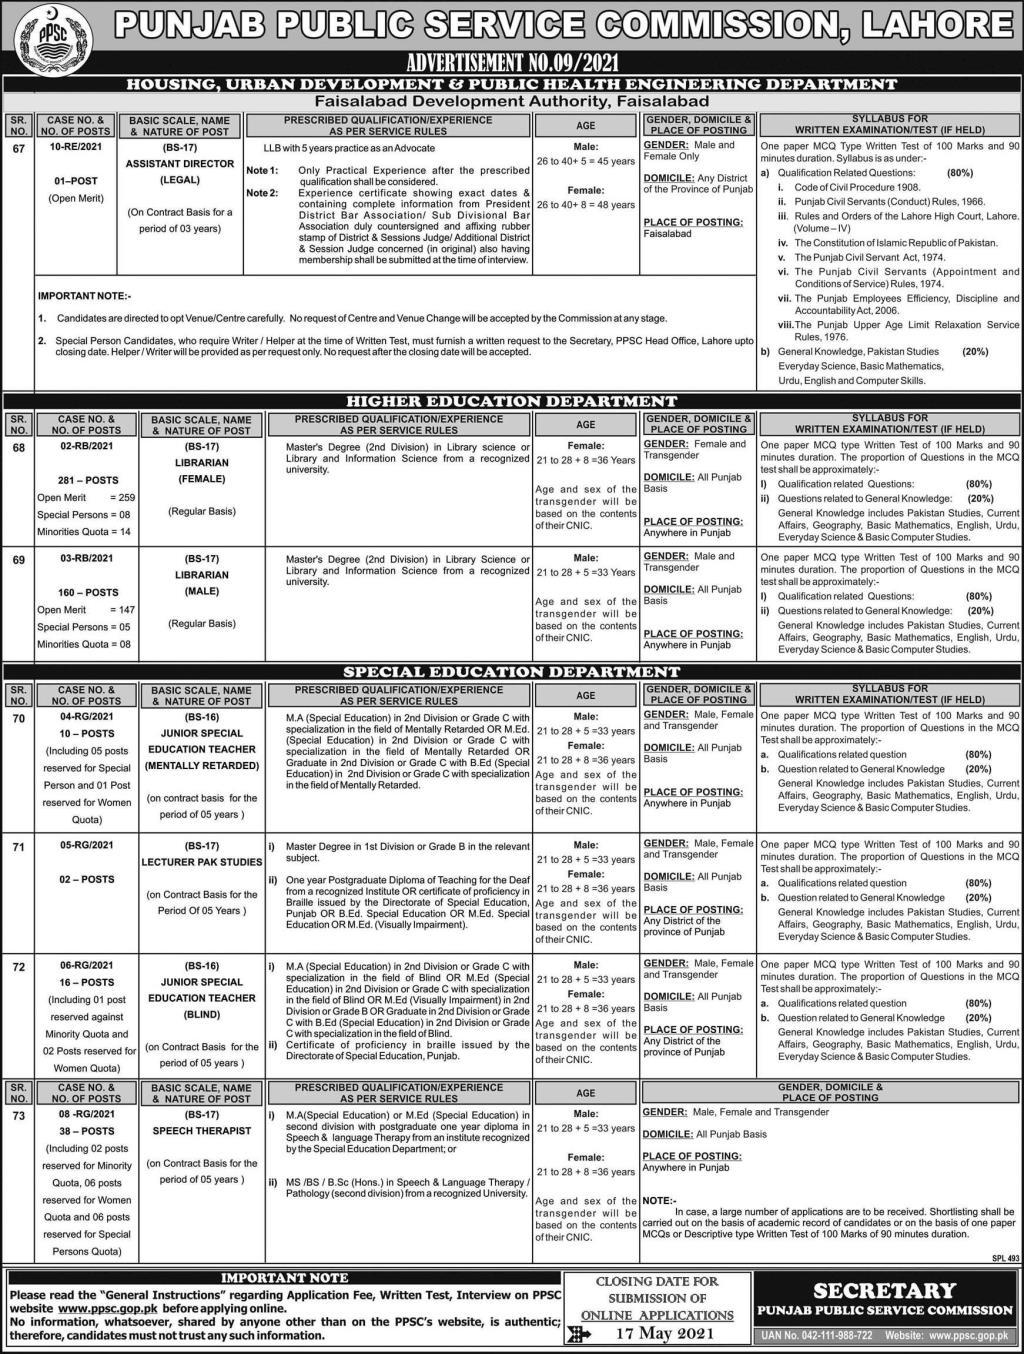 PPSC Lahore Jobs Advertisement No 9 2021